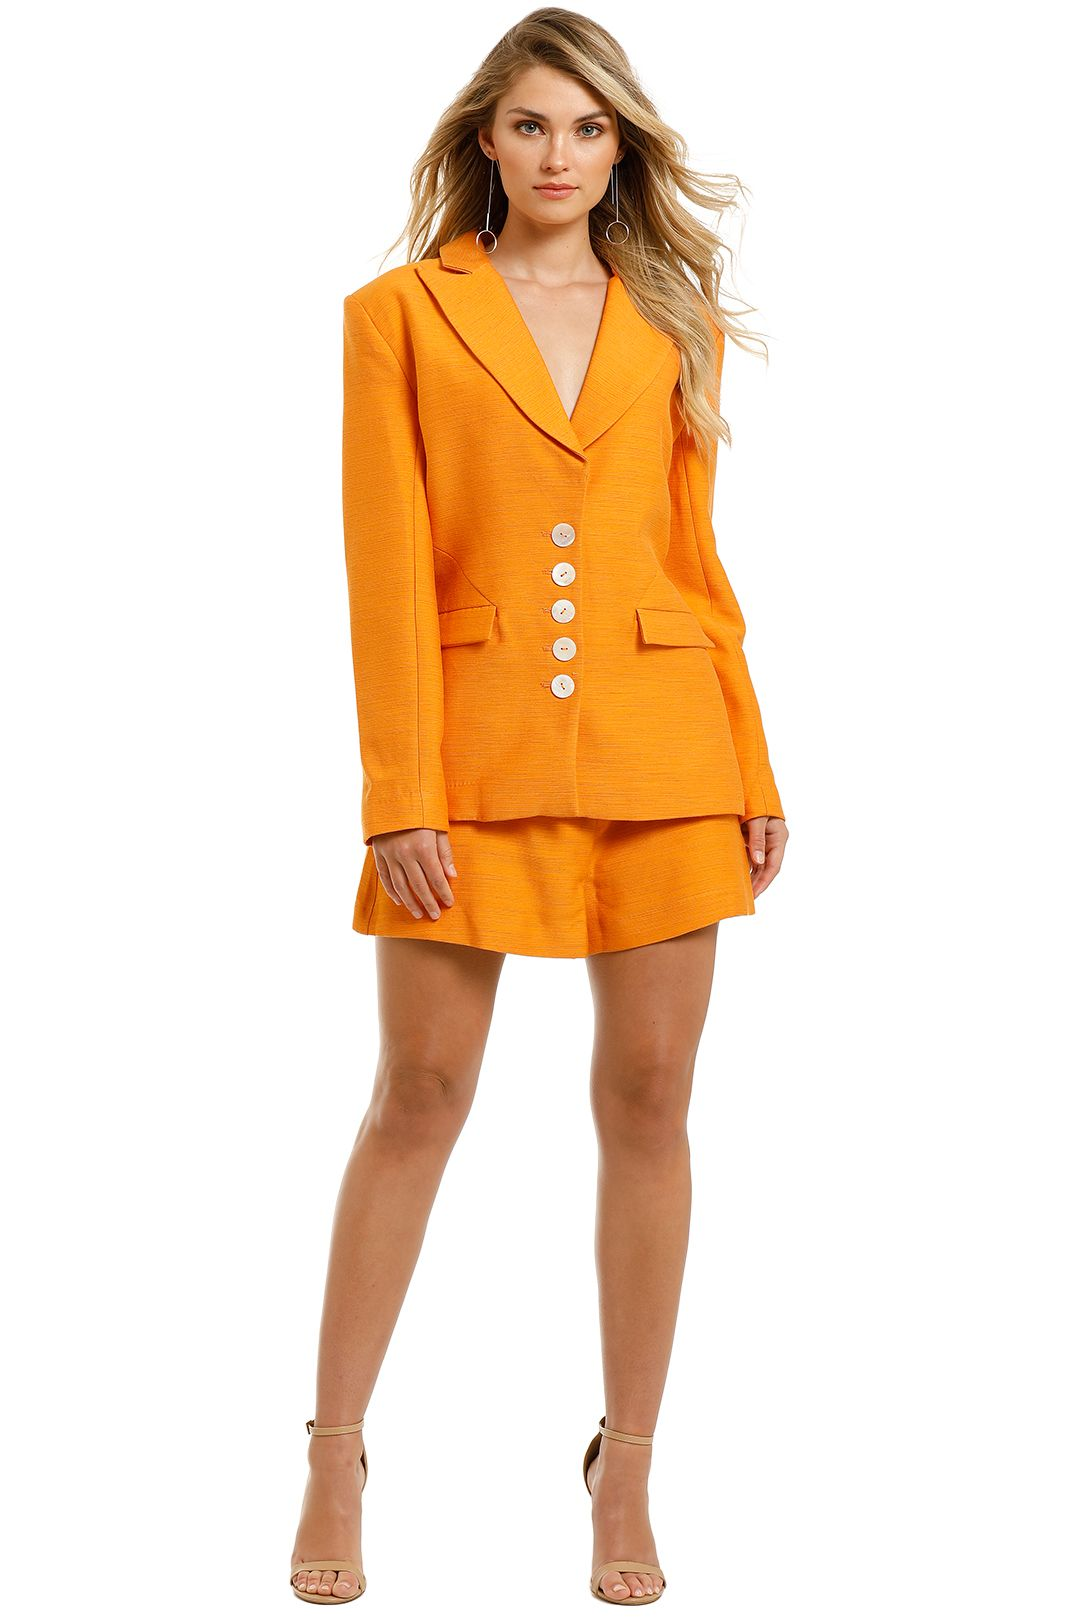 Keepsake-the-Label-Magic-Touch-Blazer-and-Short-Set-Orange-Front